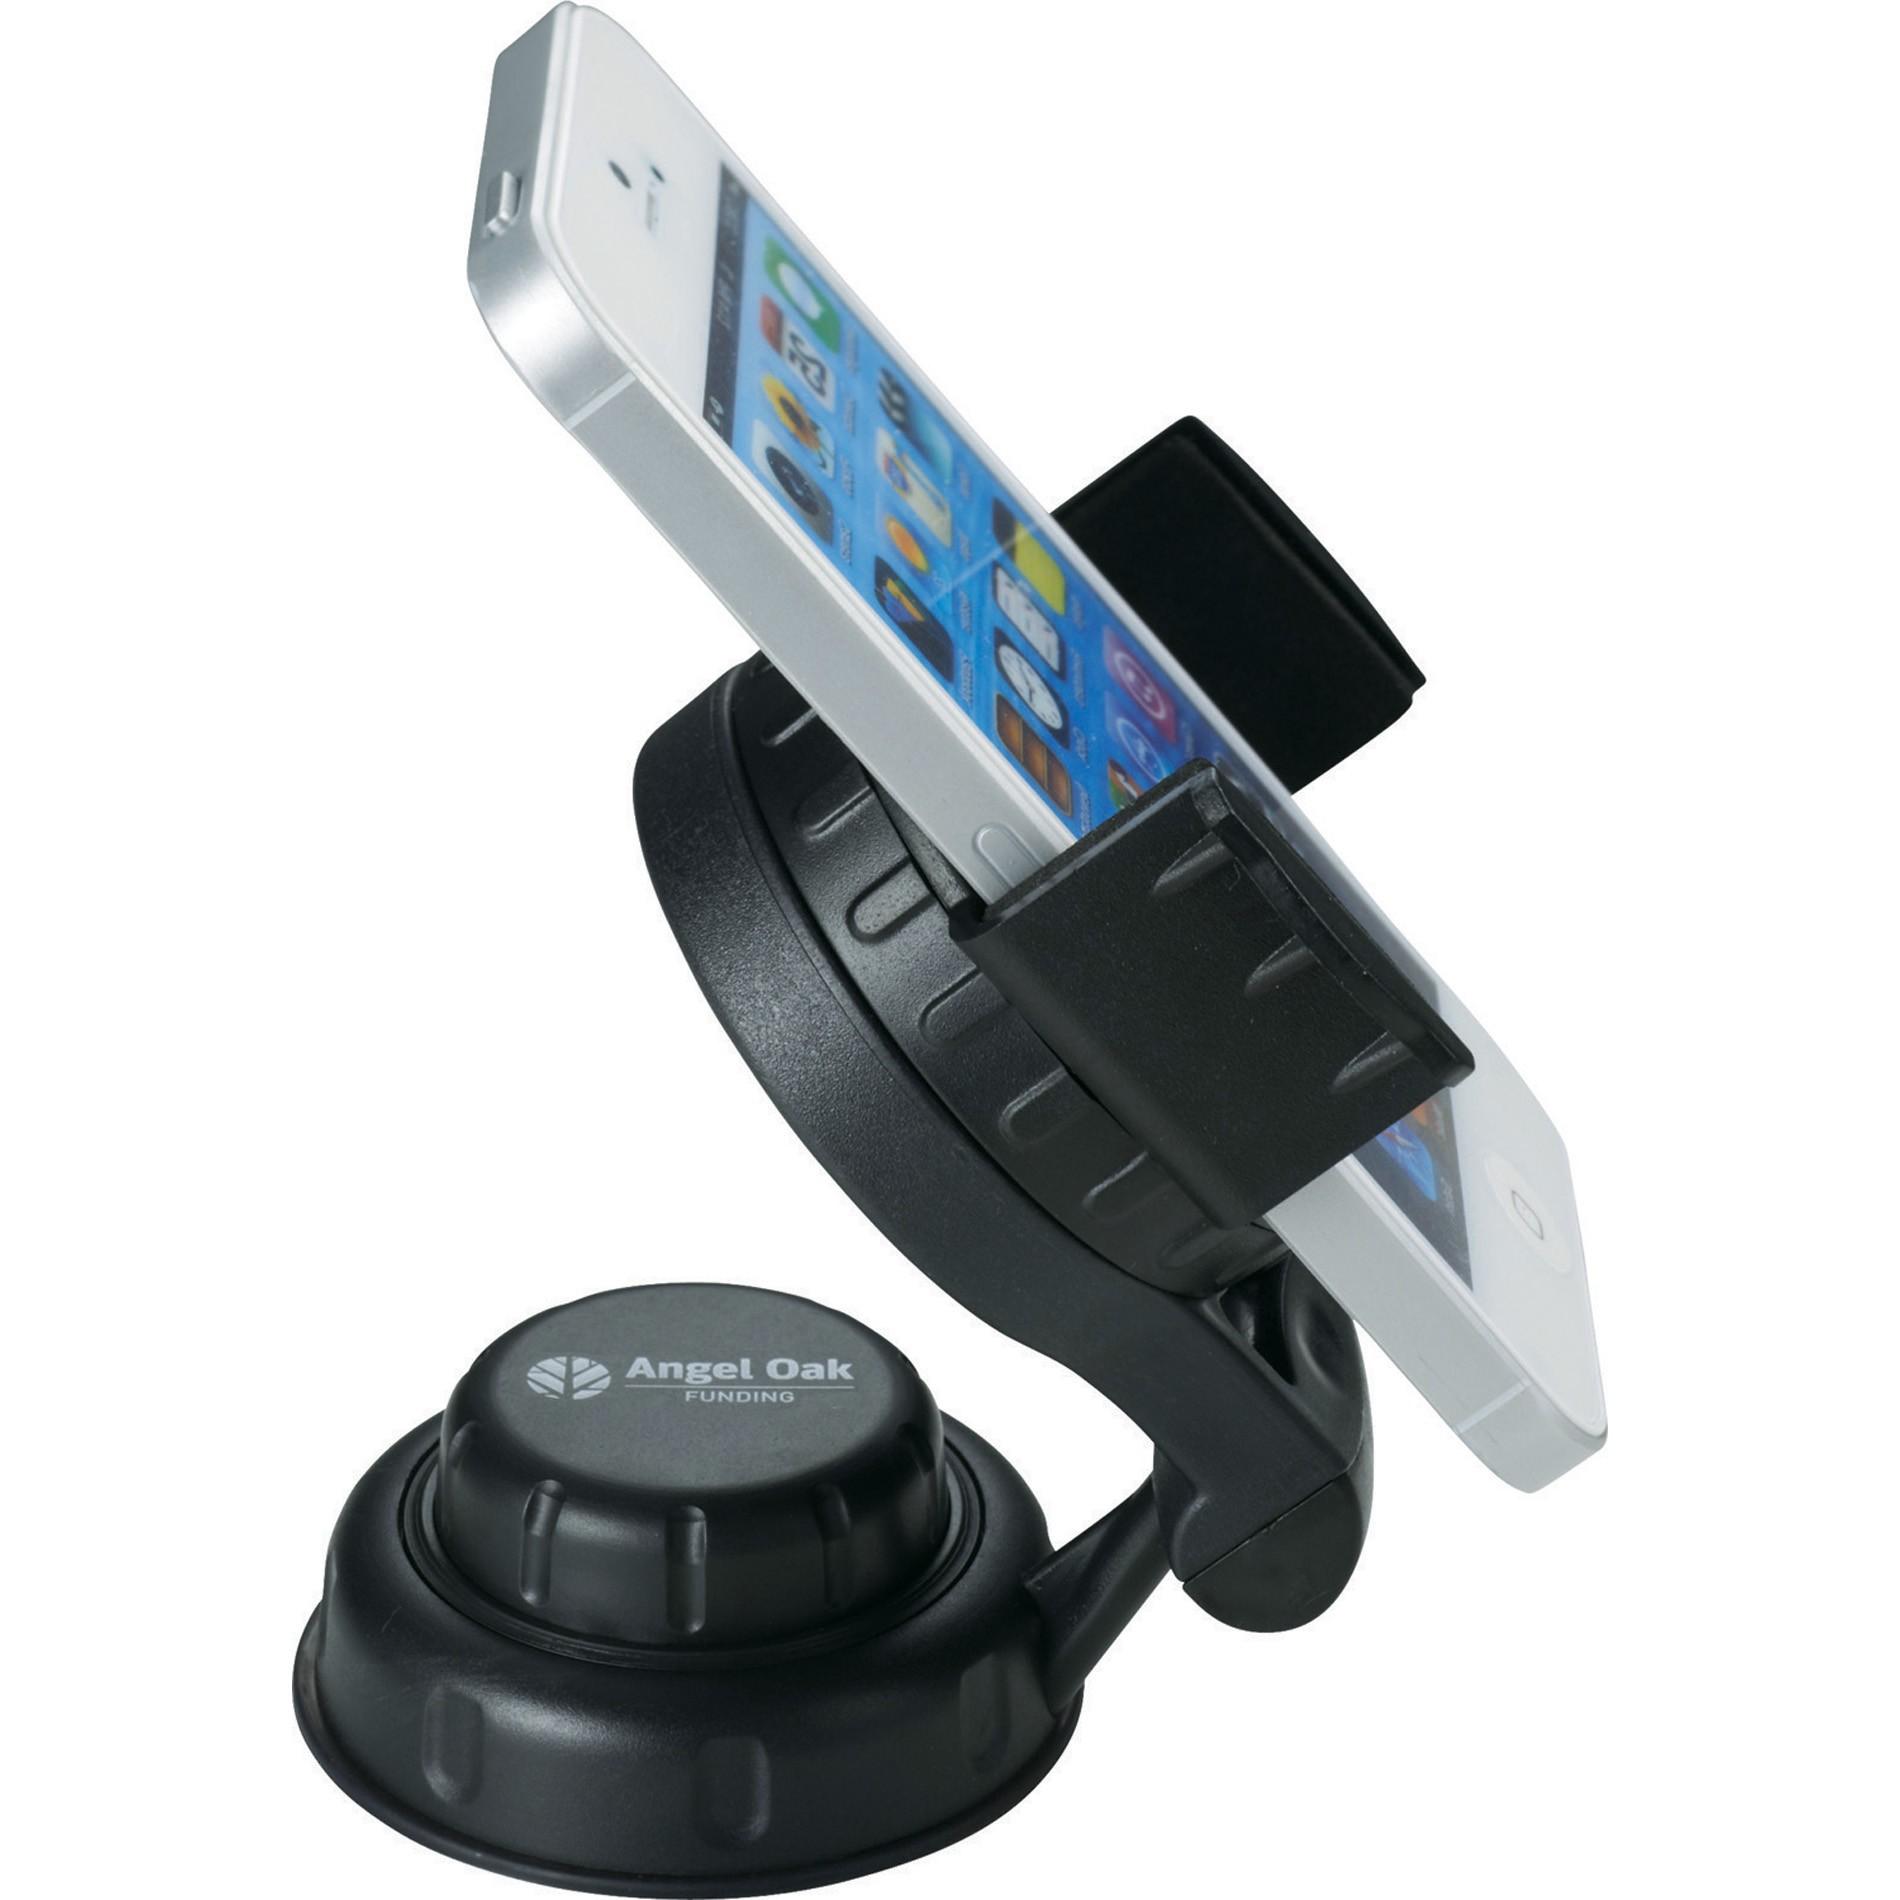 Deluxe Swivel Dashboard Phone Holder - 3350-61